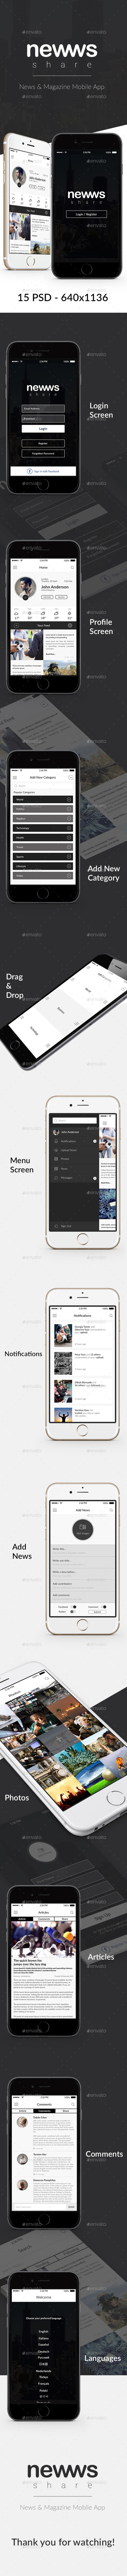 Newws Share News & Magazine App UI